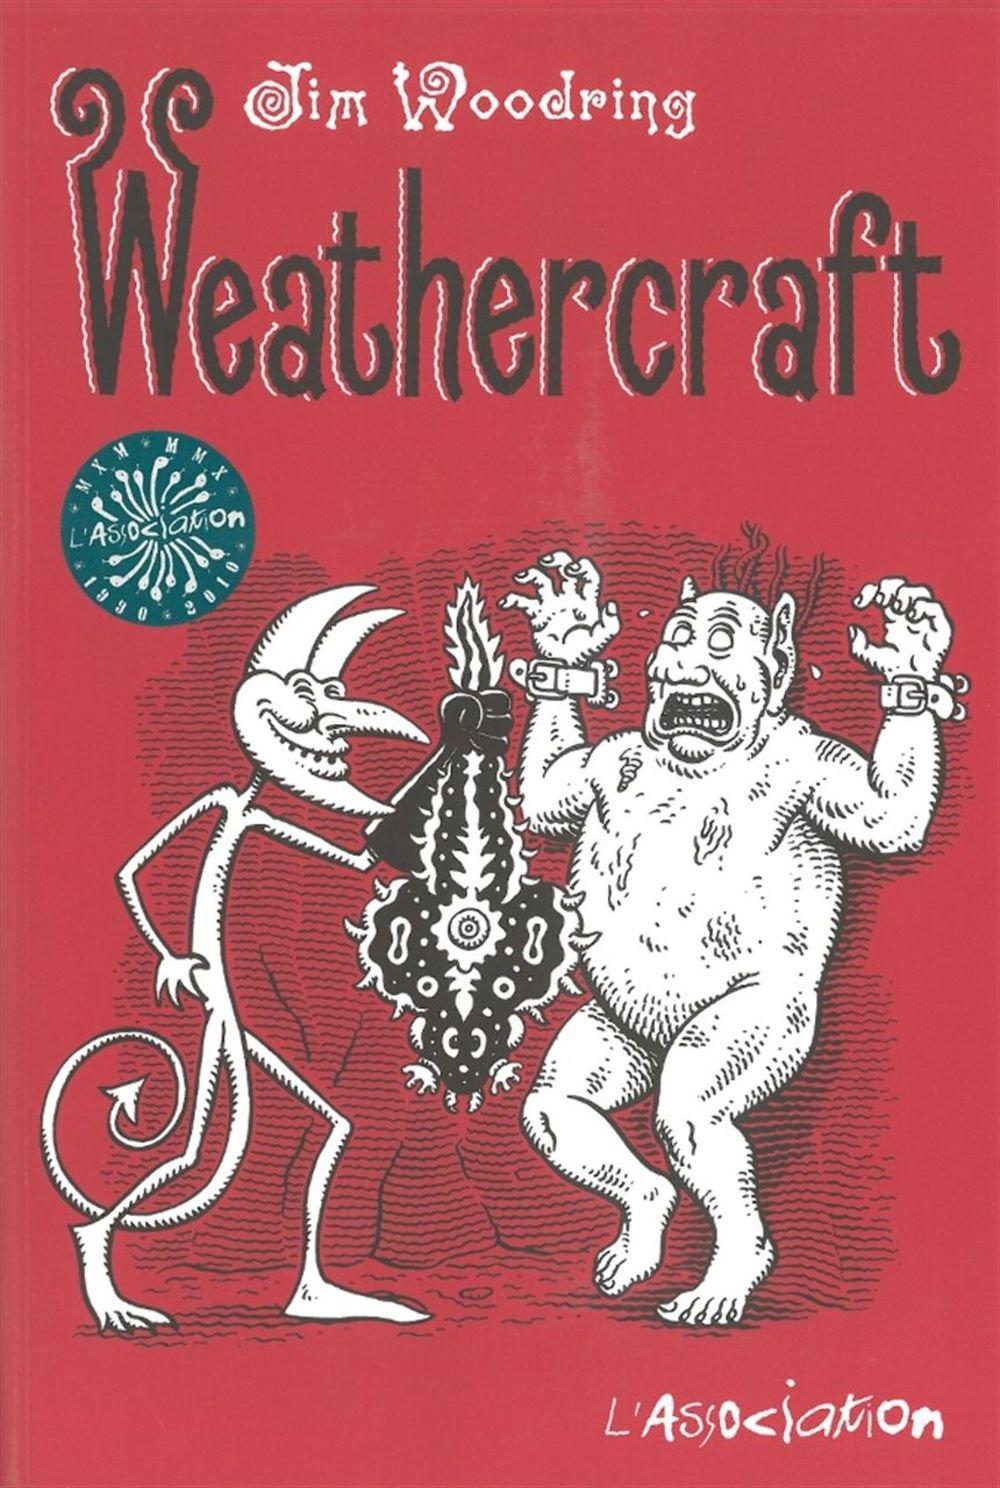 weathercraft french edition 9782844143907 amazon com books